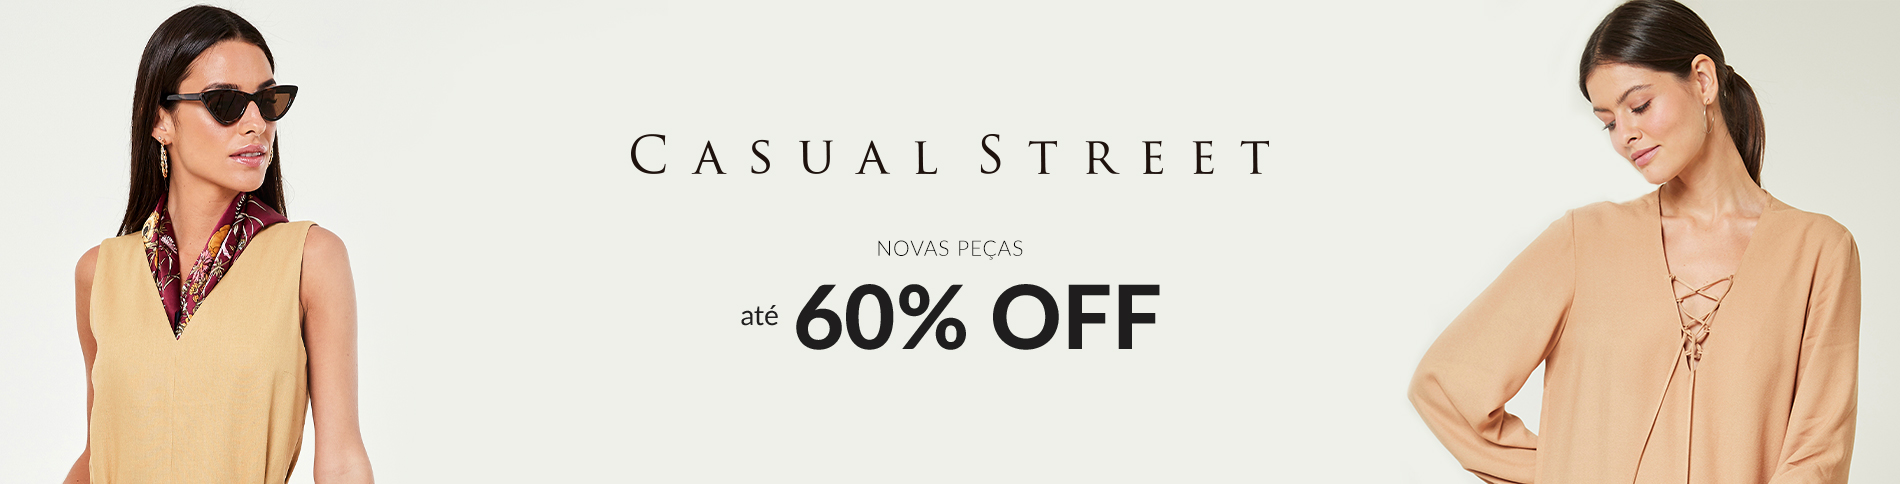 Casual Street